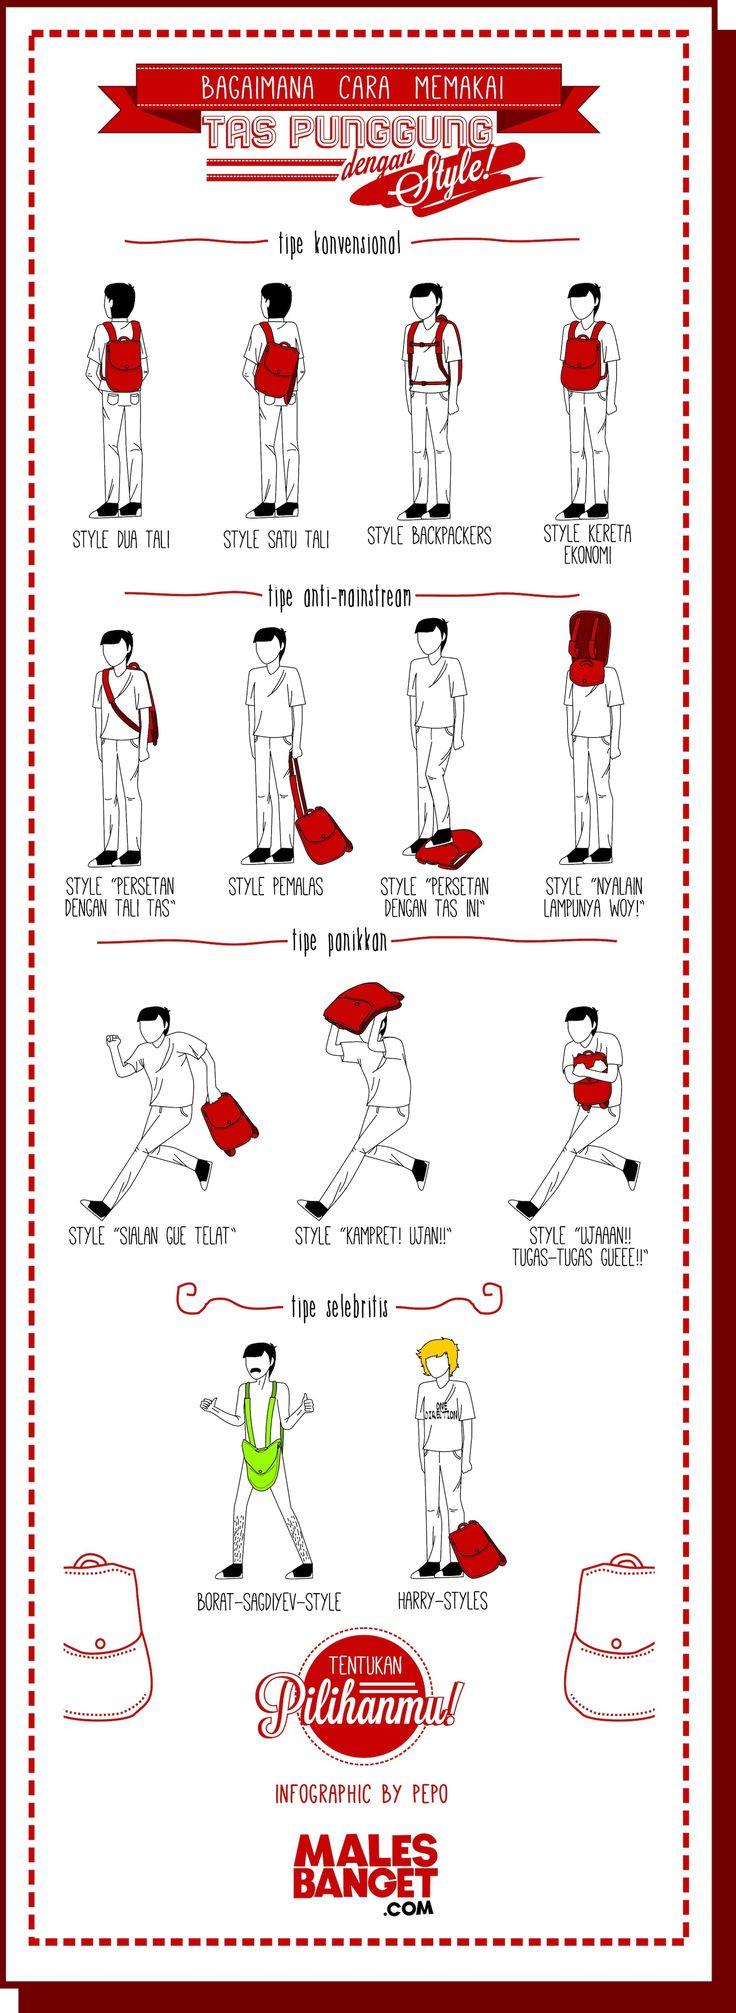 Cara Memakai Tas Punggung dengan Style!